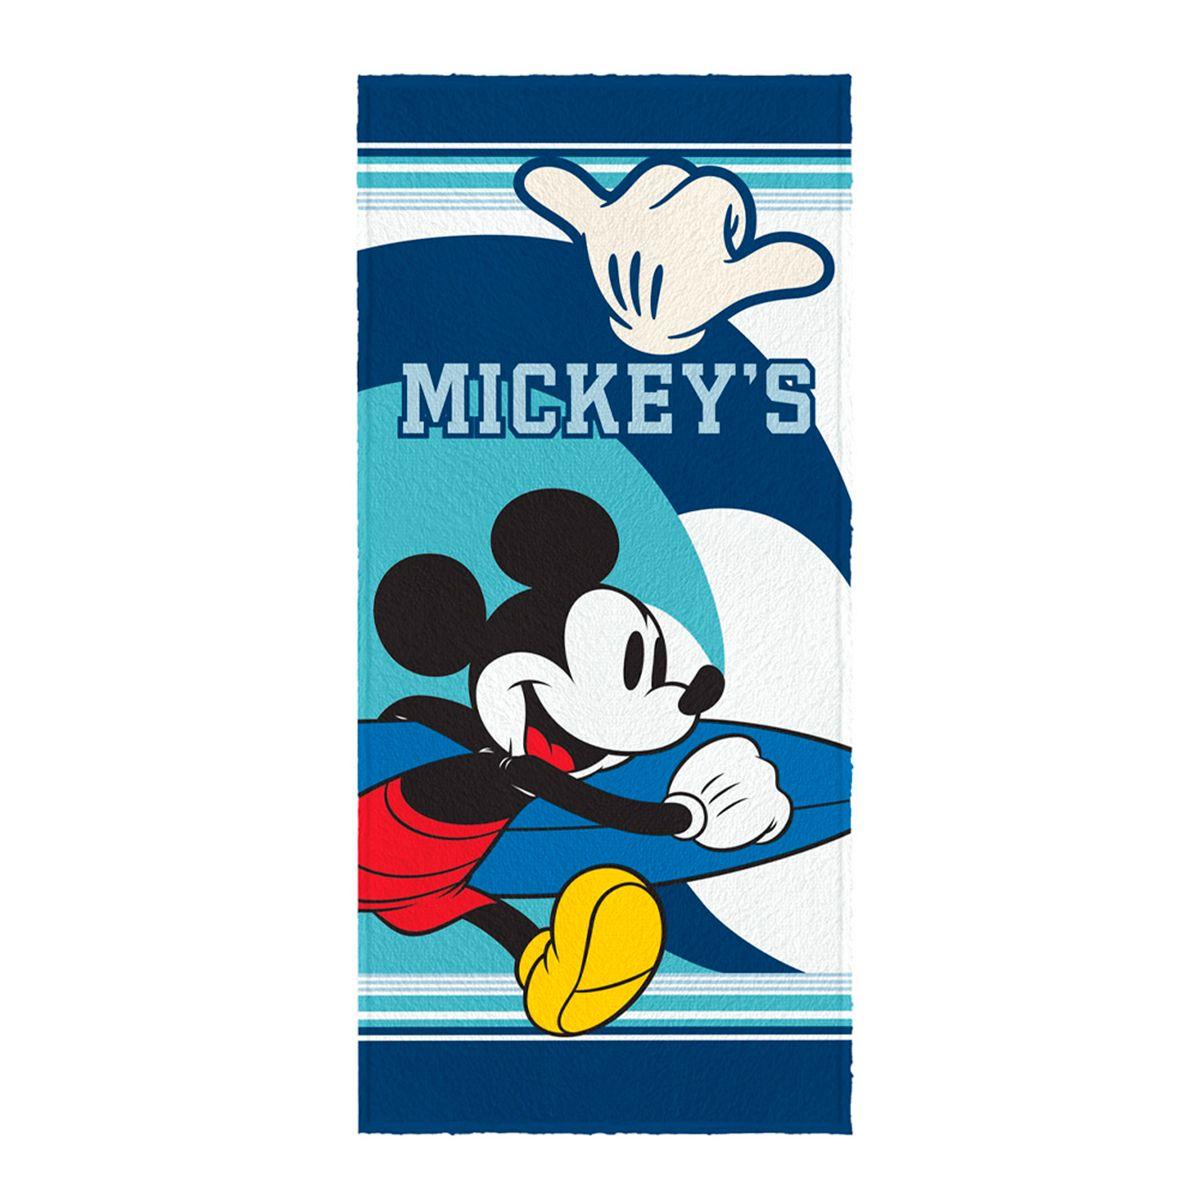 Toalha de Banho Felpuda infantil Mickey Mod 4